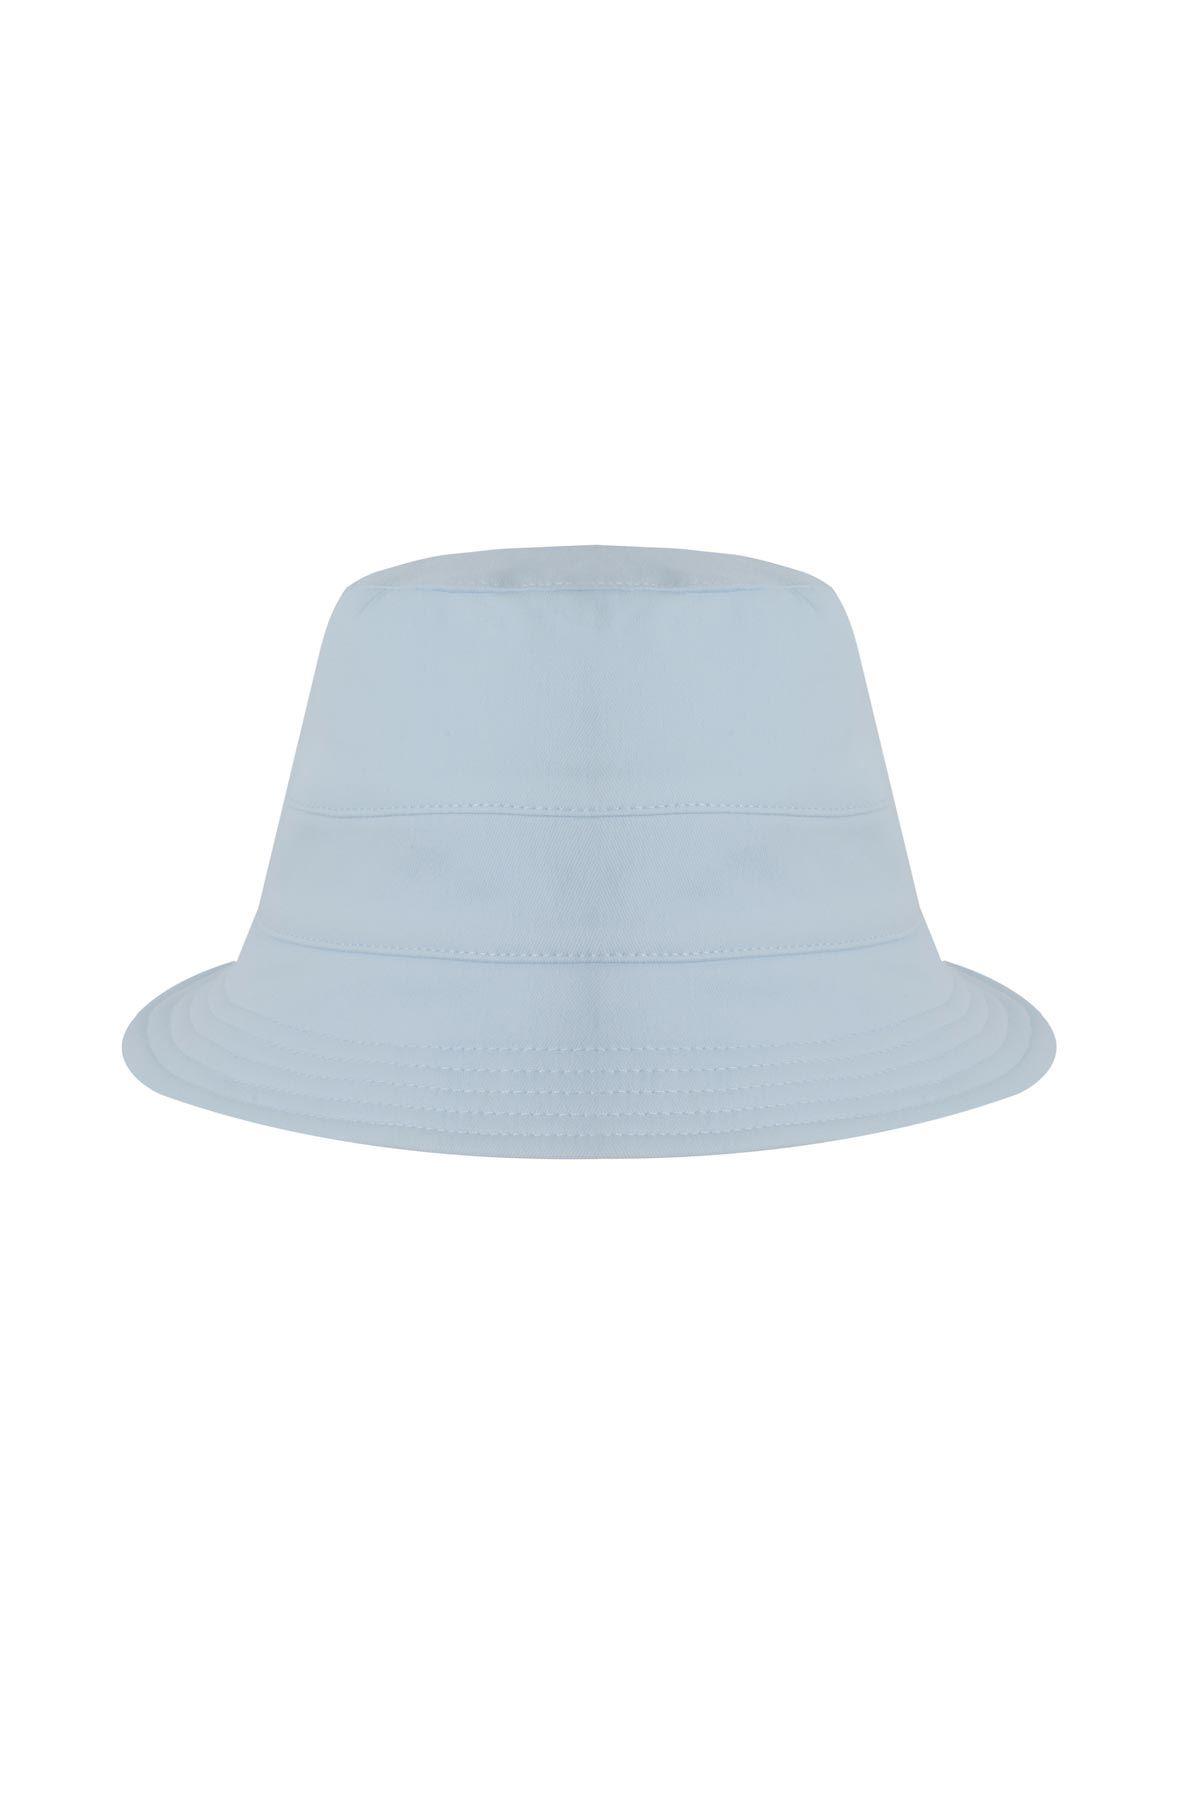 Düz şapka Mavi